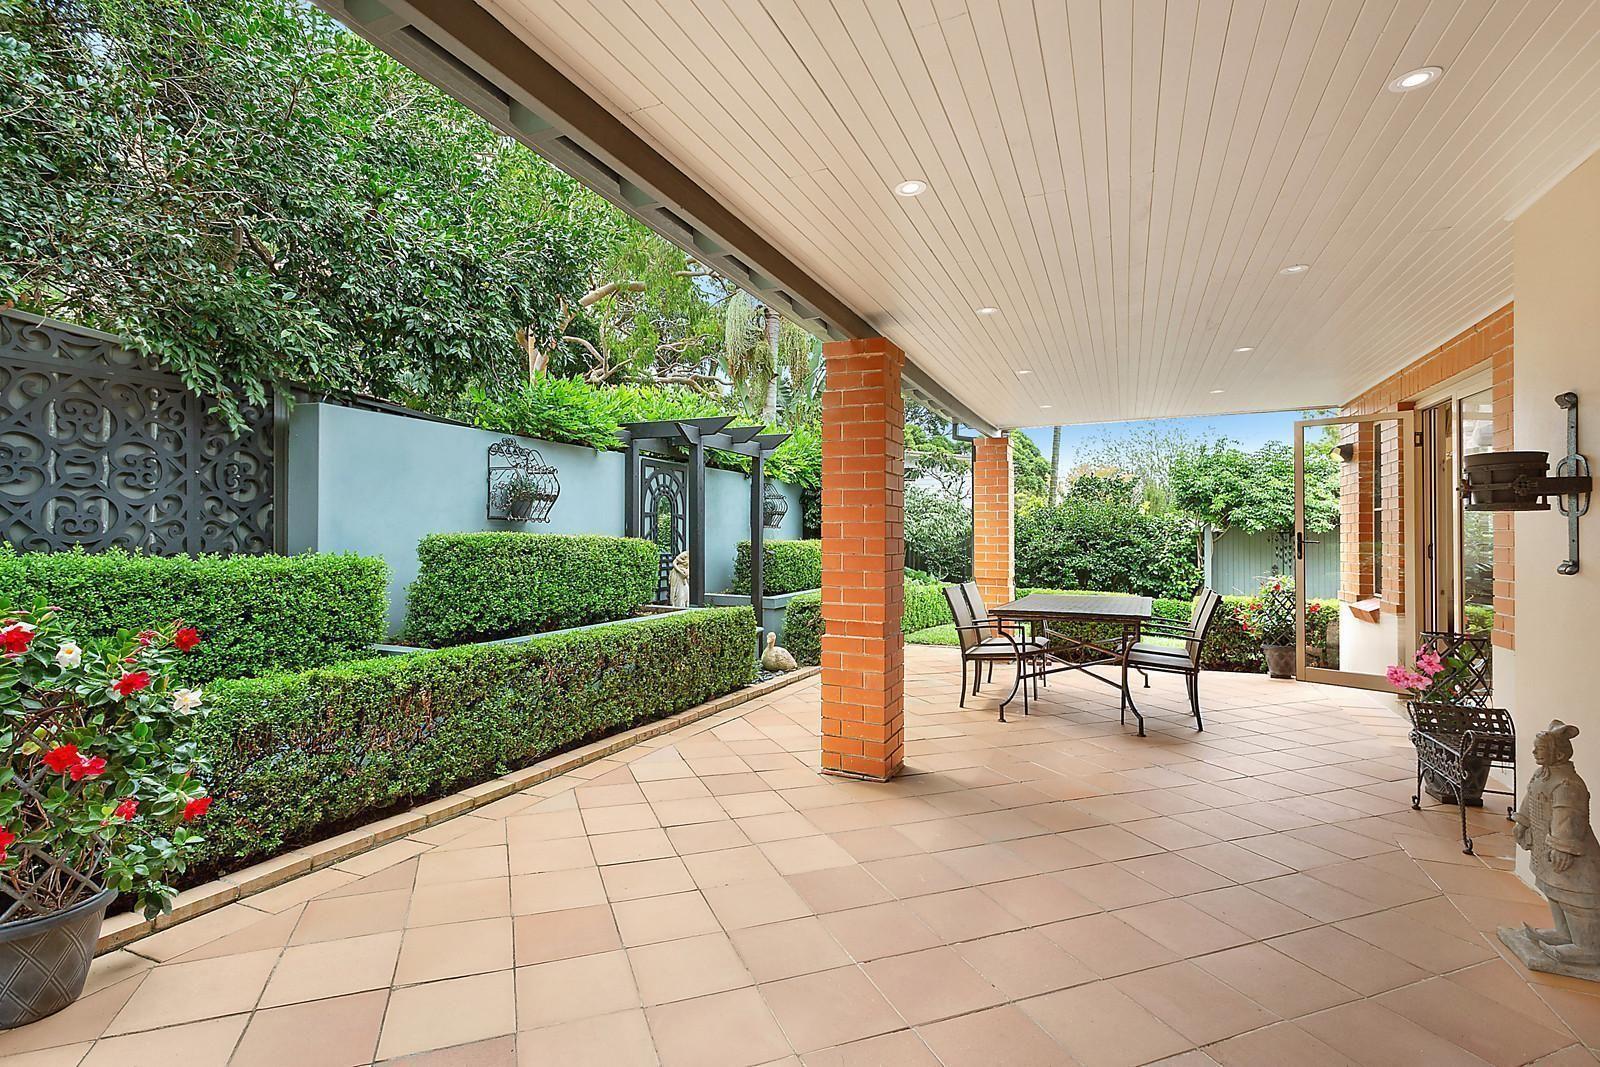 2/1-3 Bass Street, Dolans Bay NSW 2229, Image 0